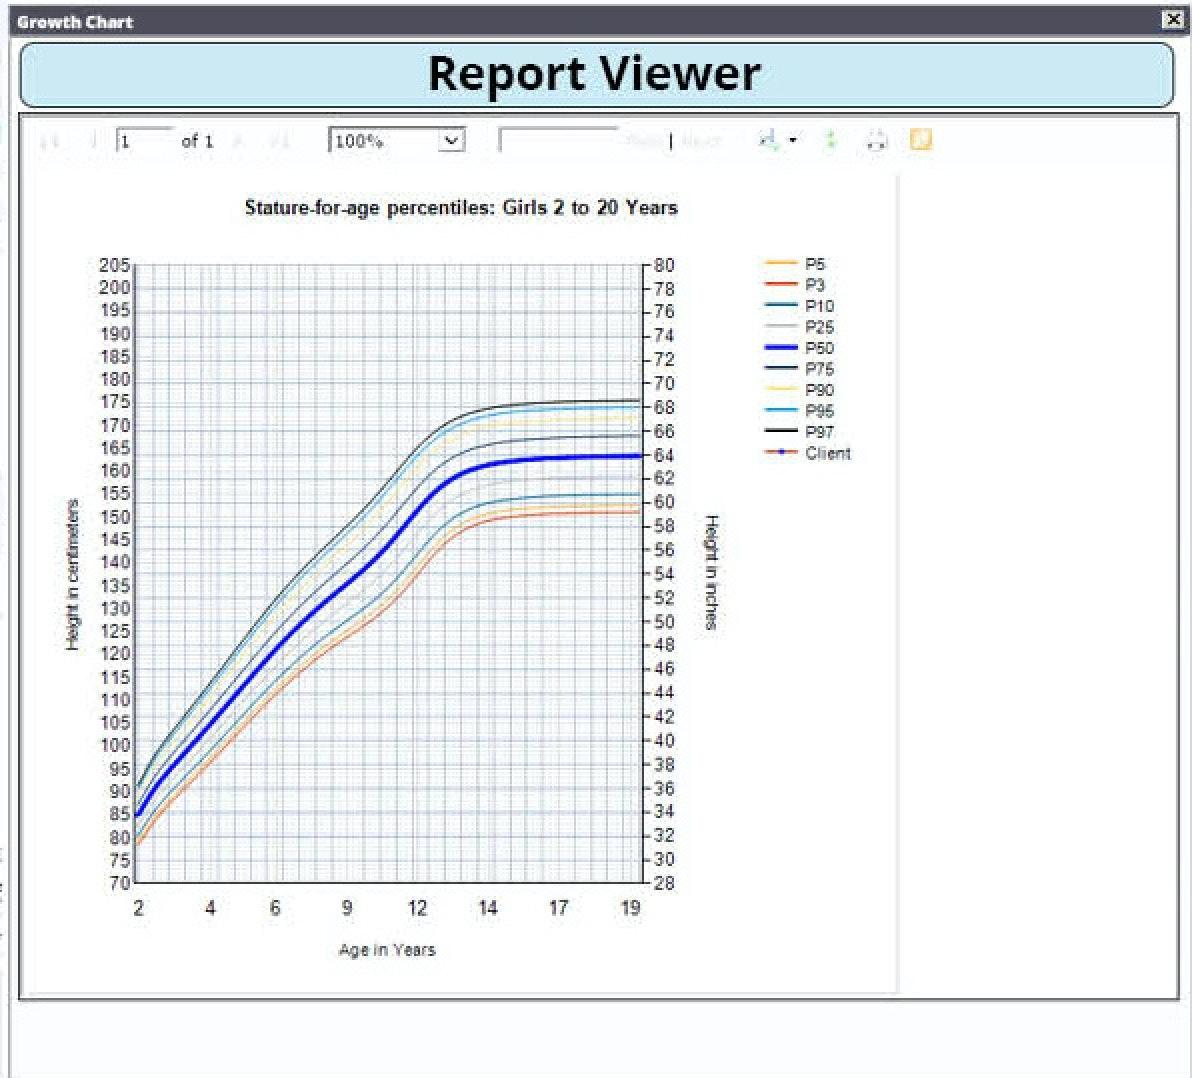 Report viewer